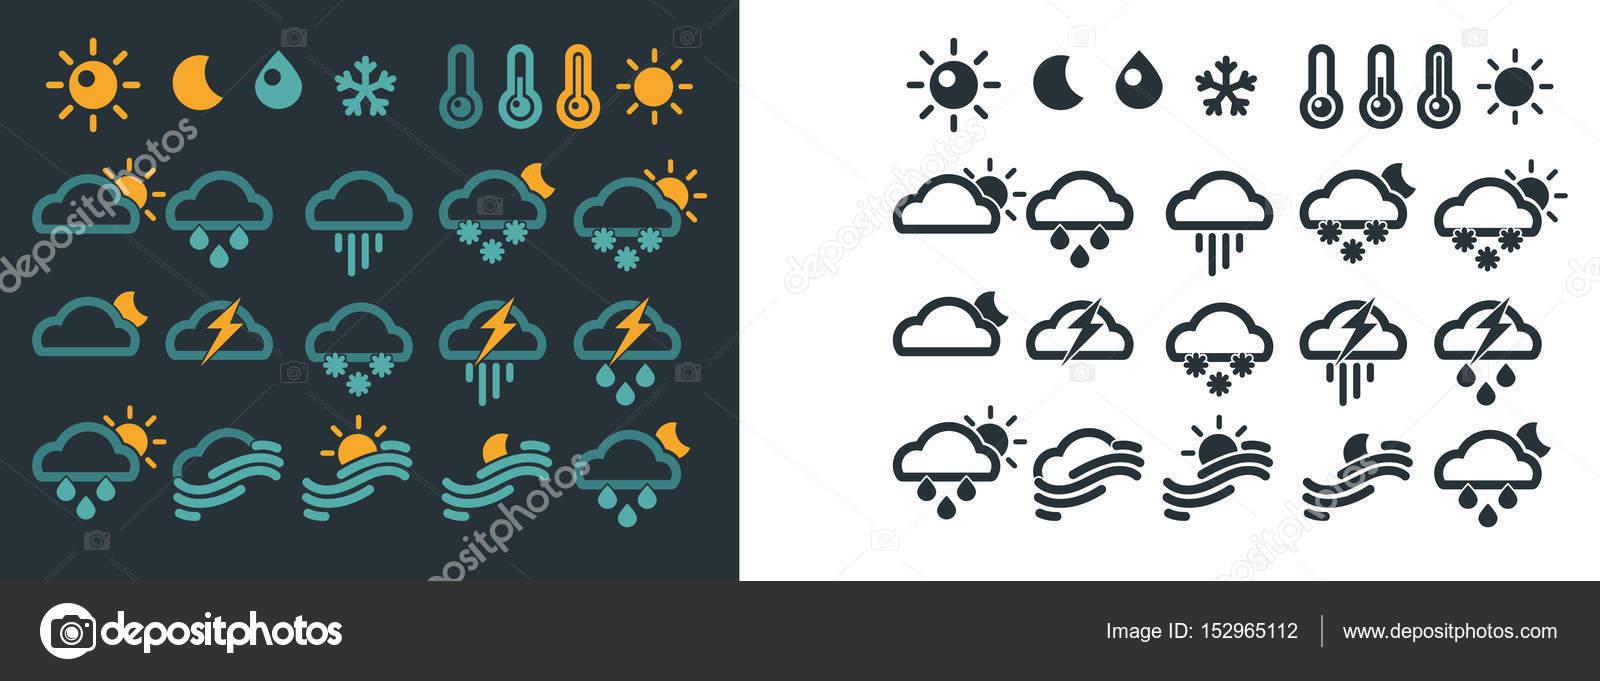 Weather Forecast Symbols Stock Vector Sonulkaster 152965112